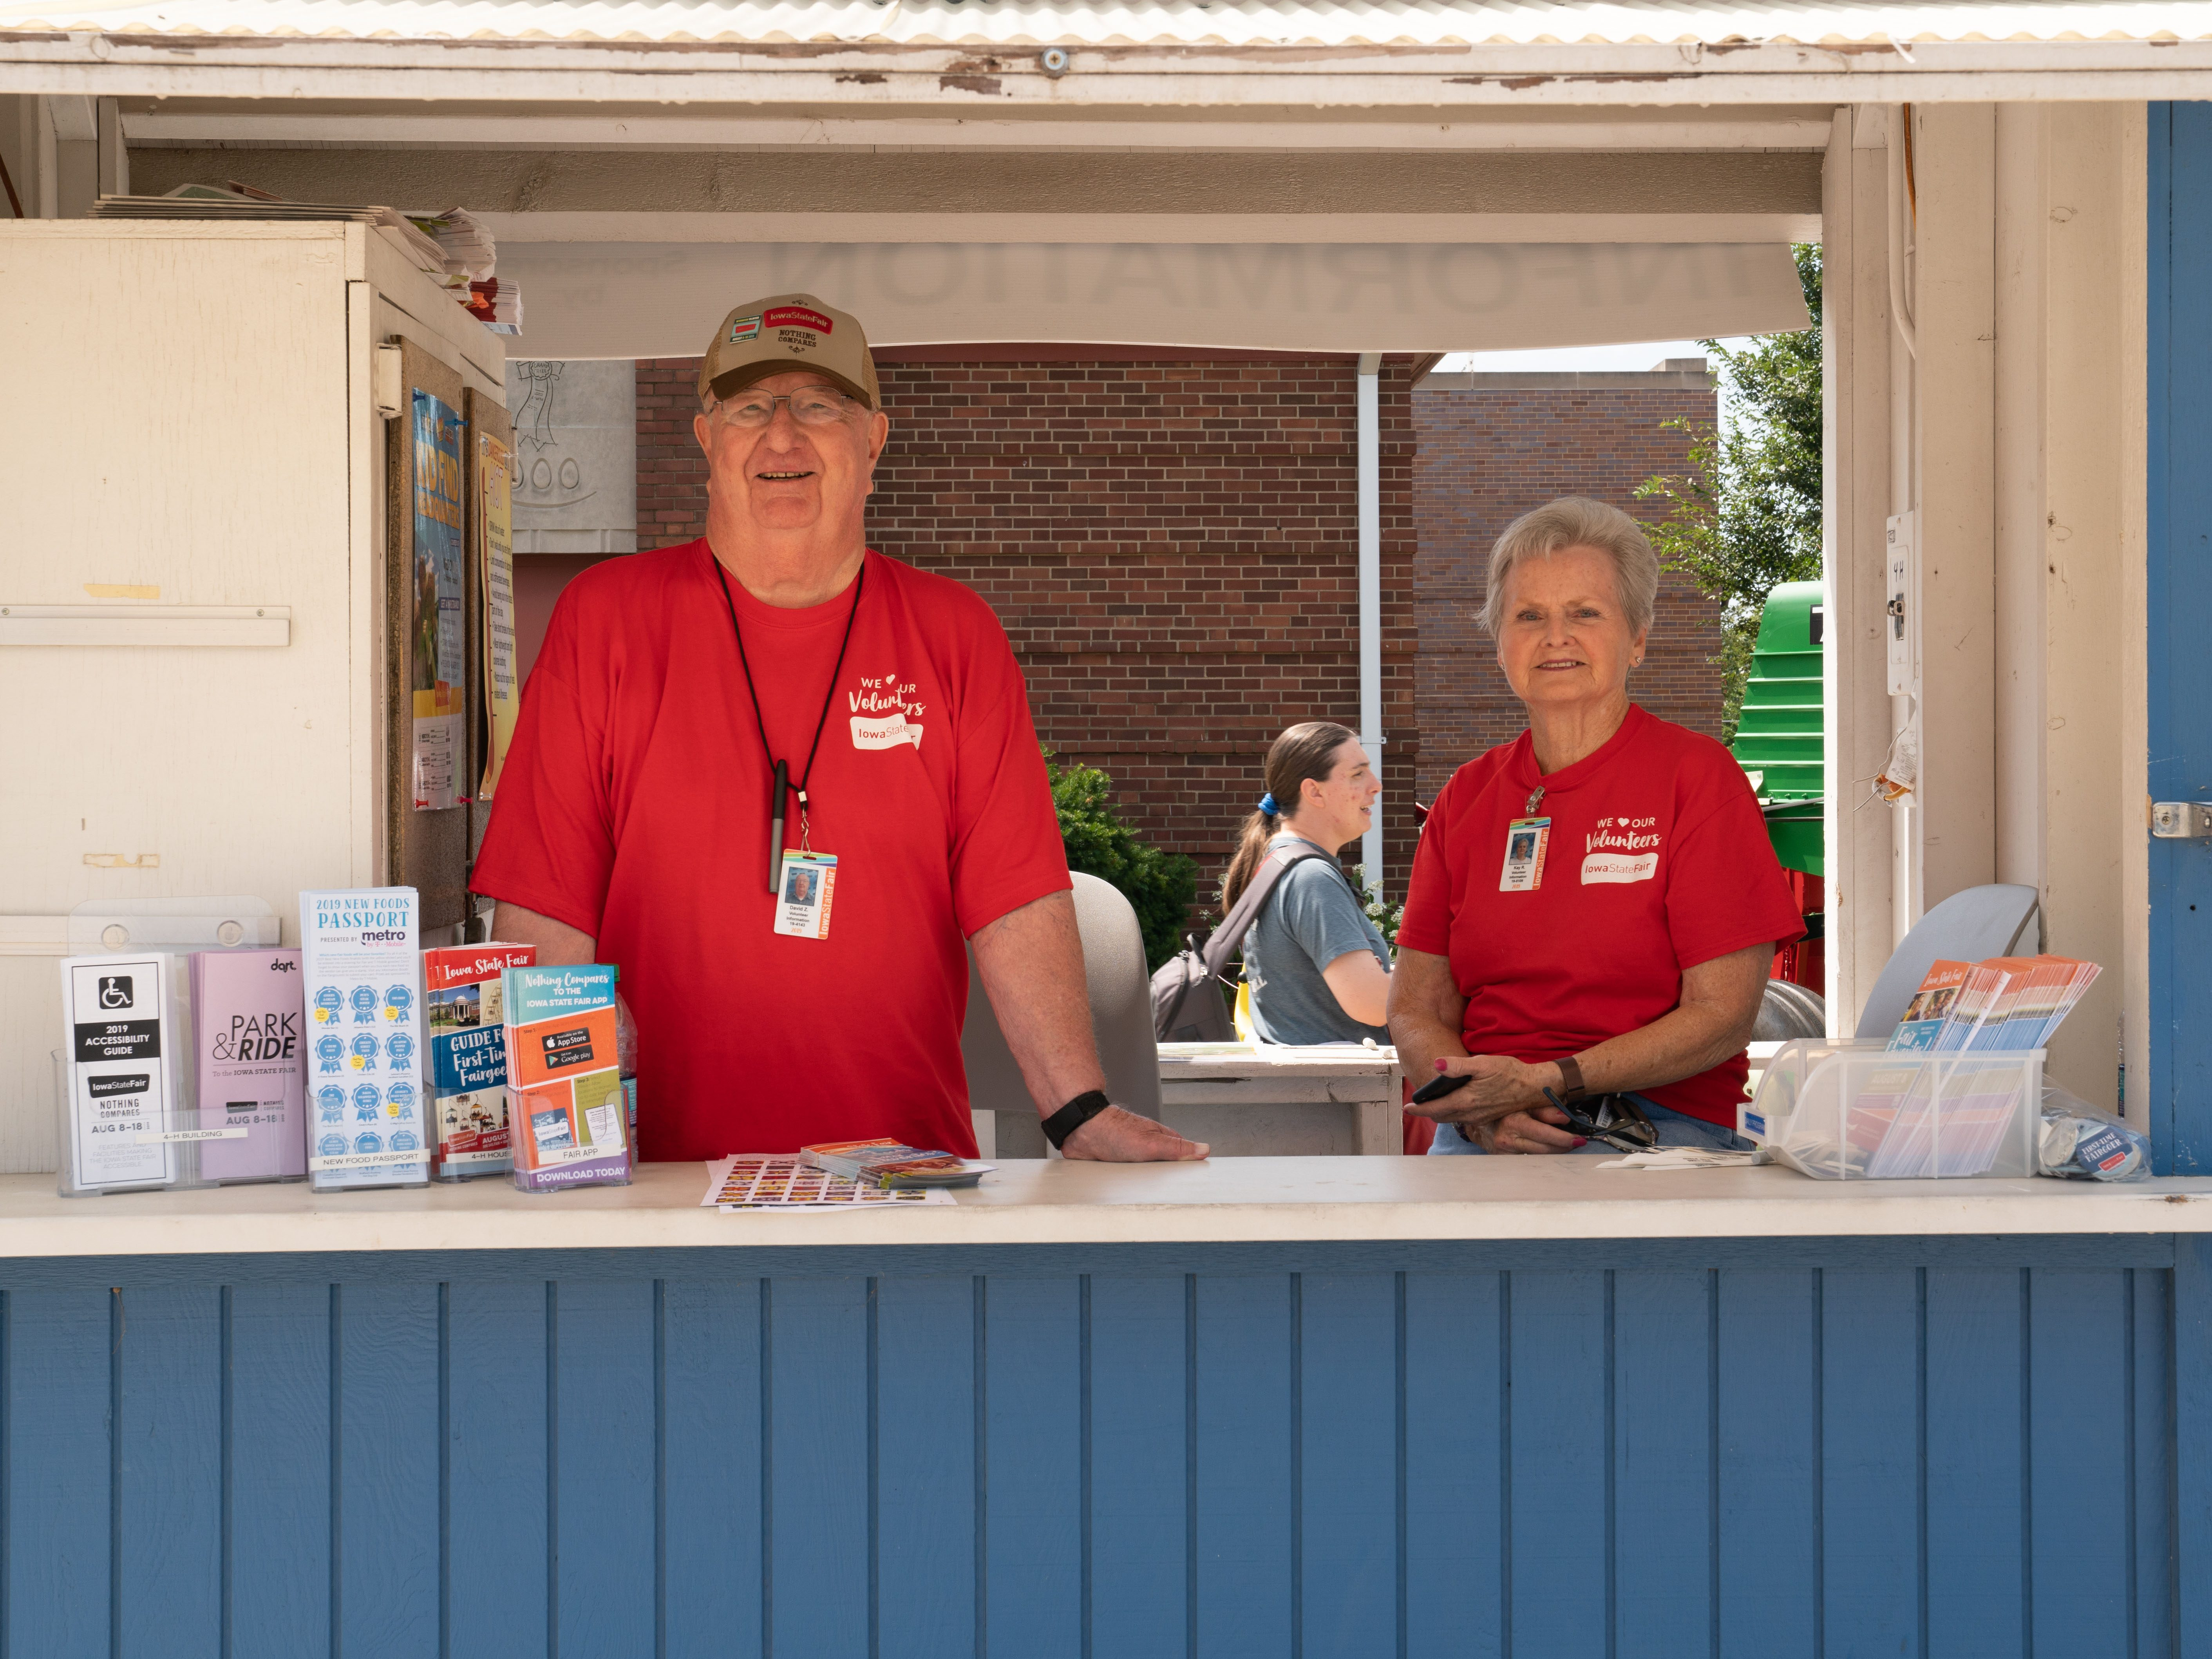 Volunteer at the Fair!